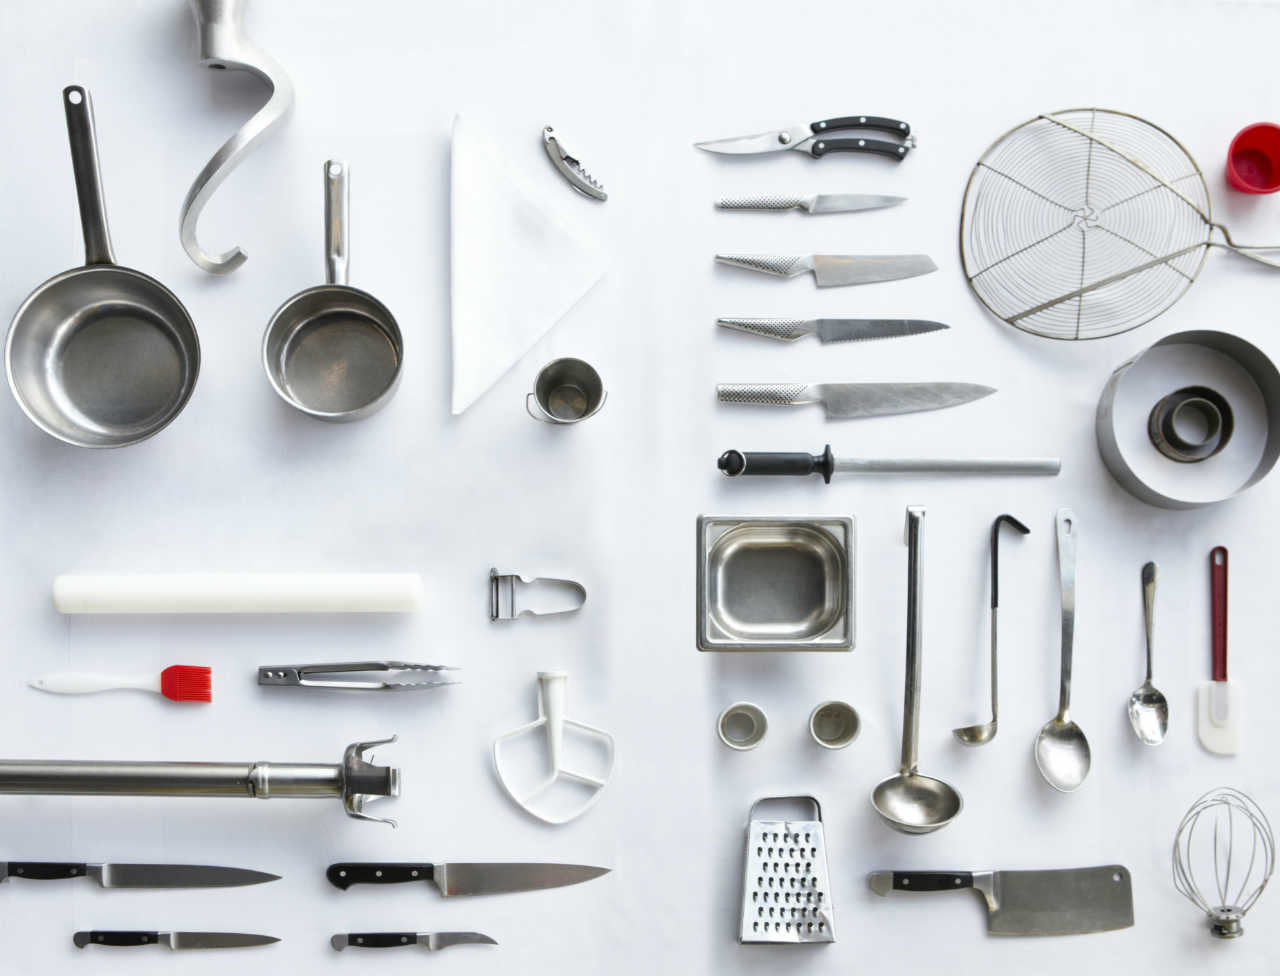 Cuisine et ustensiles korea cute - Materiel de cuisine occasion professionnel ...